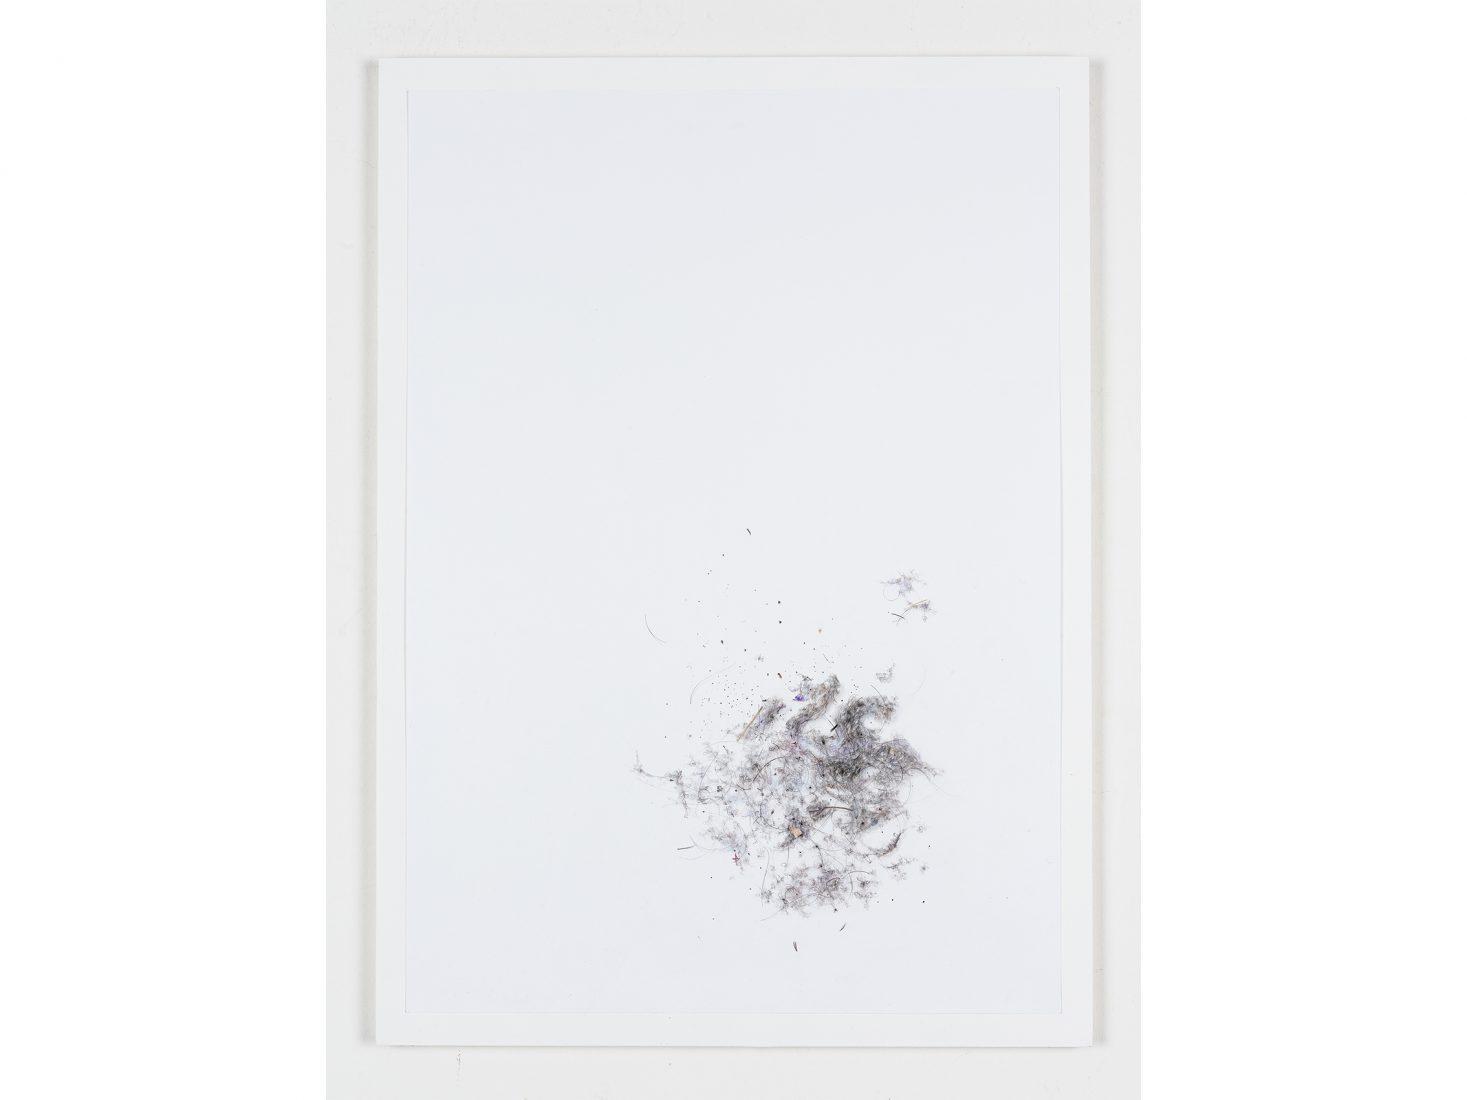 Michail Michailov. Dust to Dust#96, 2020, coloured pencil on paper, 64x46 cm